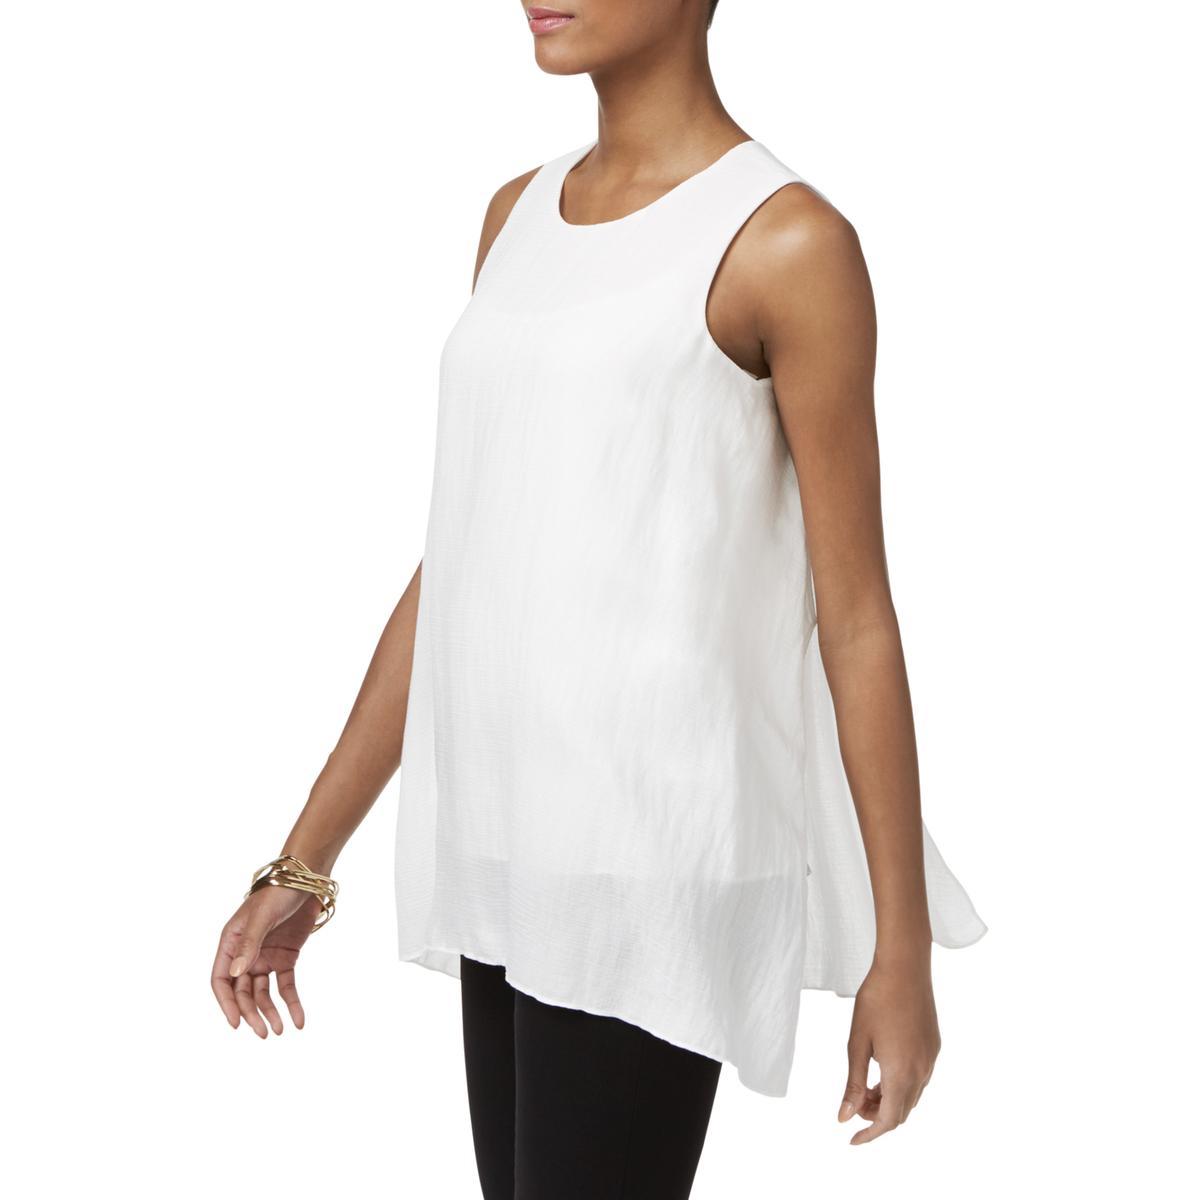 6b95bb9be10301 Details about Alfani Womens Handkerchief Hem Sleeveless Keyhole Blouse Top  BHFO 4856